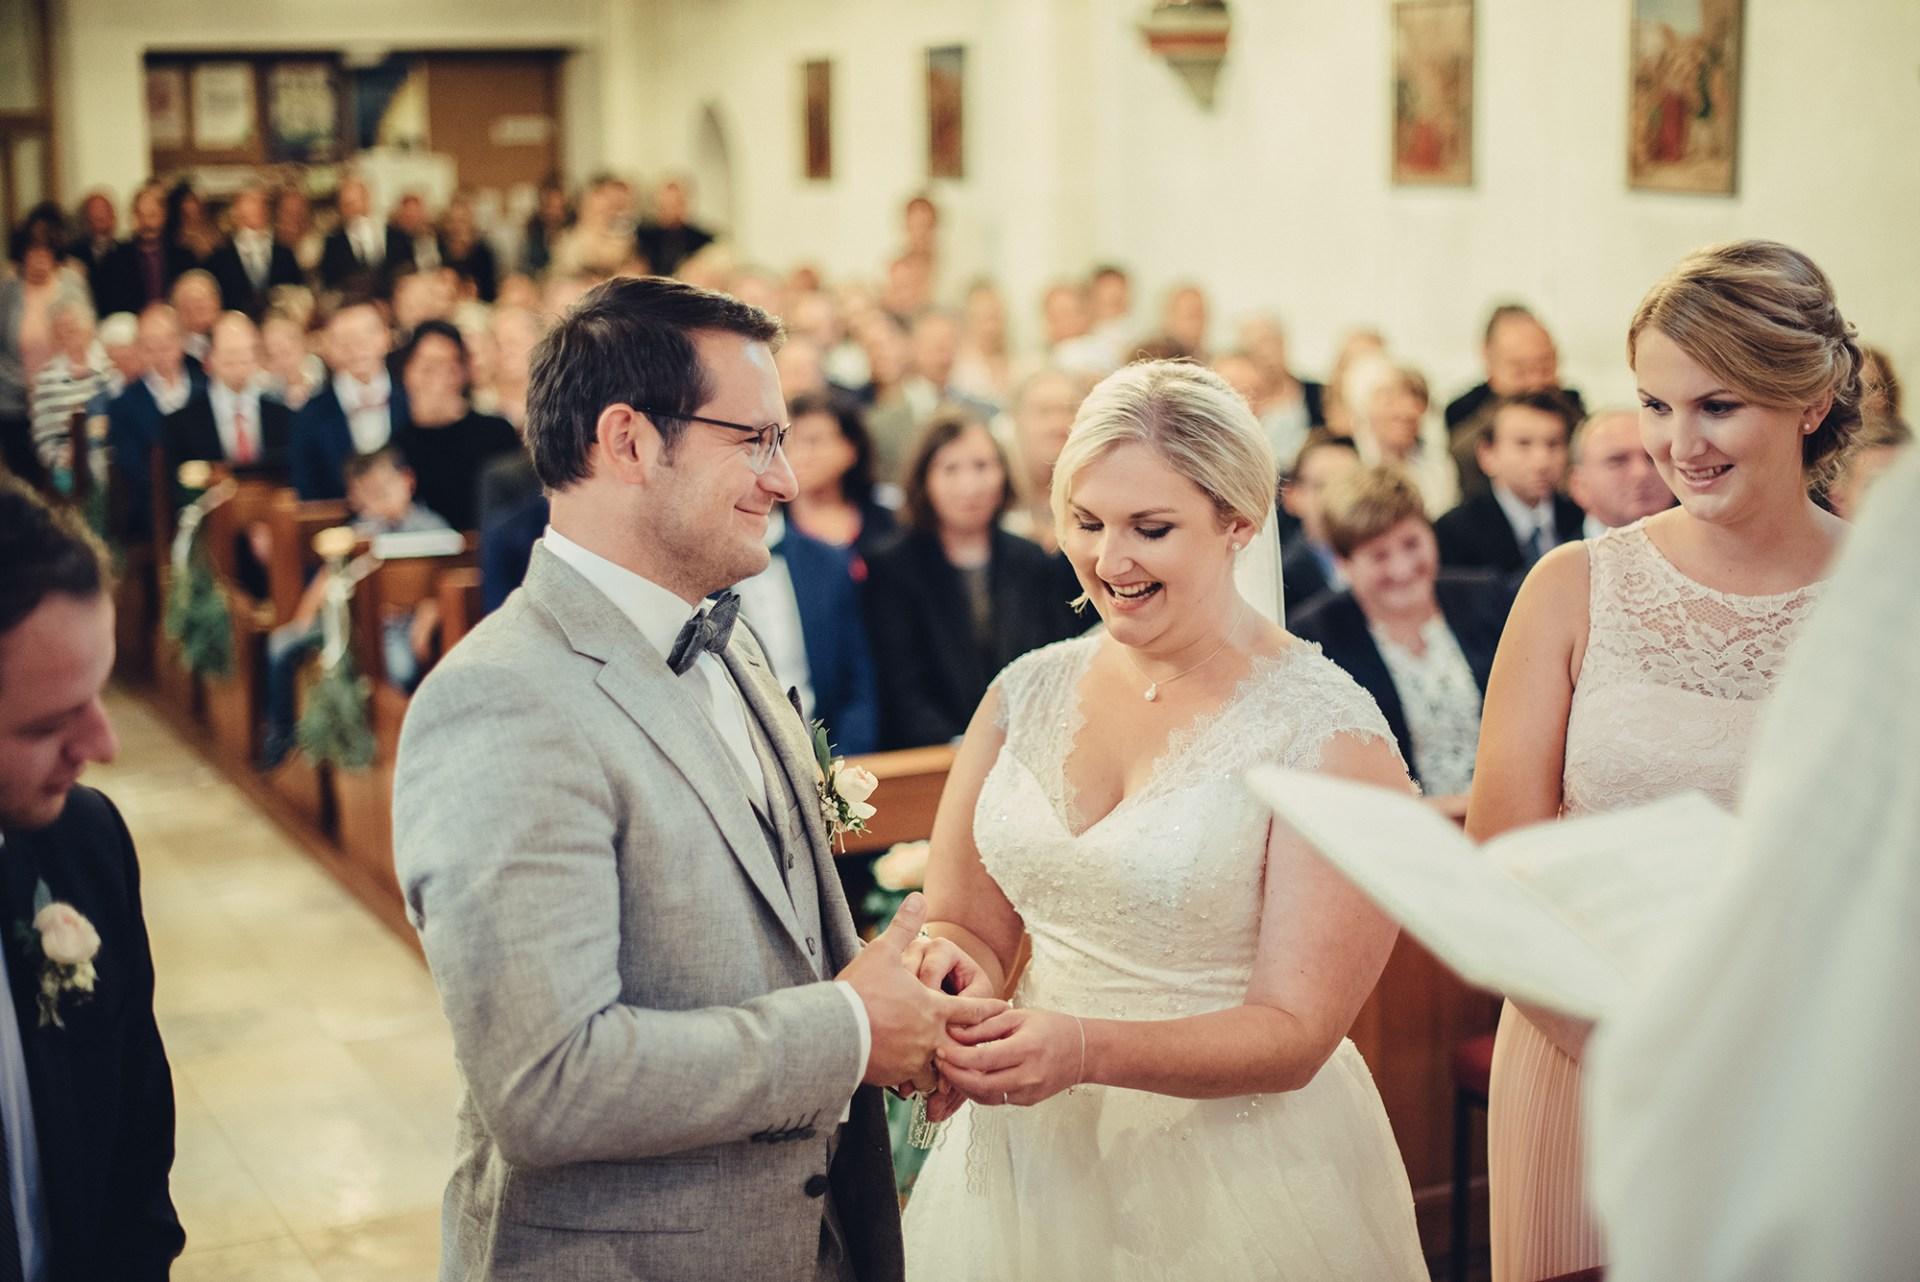 weddingseptemberluminoxx92348234030